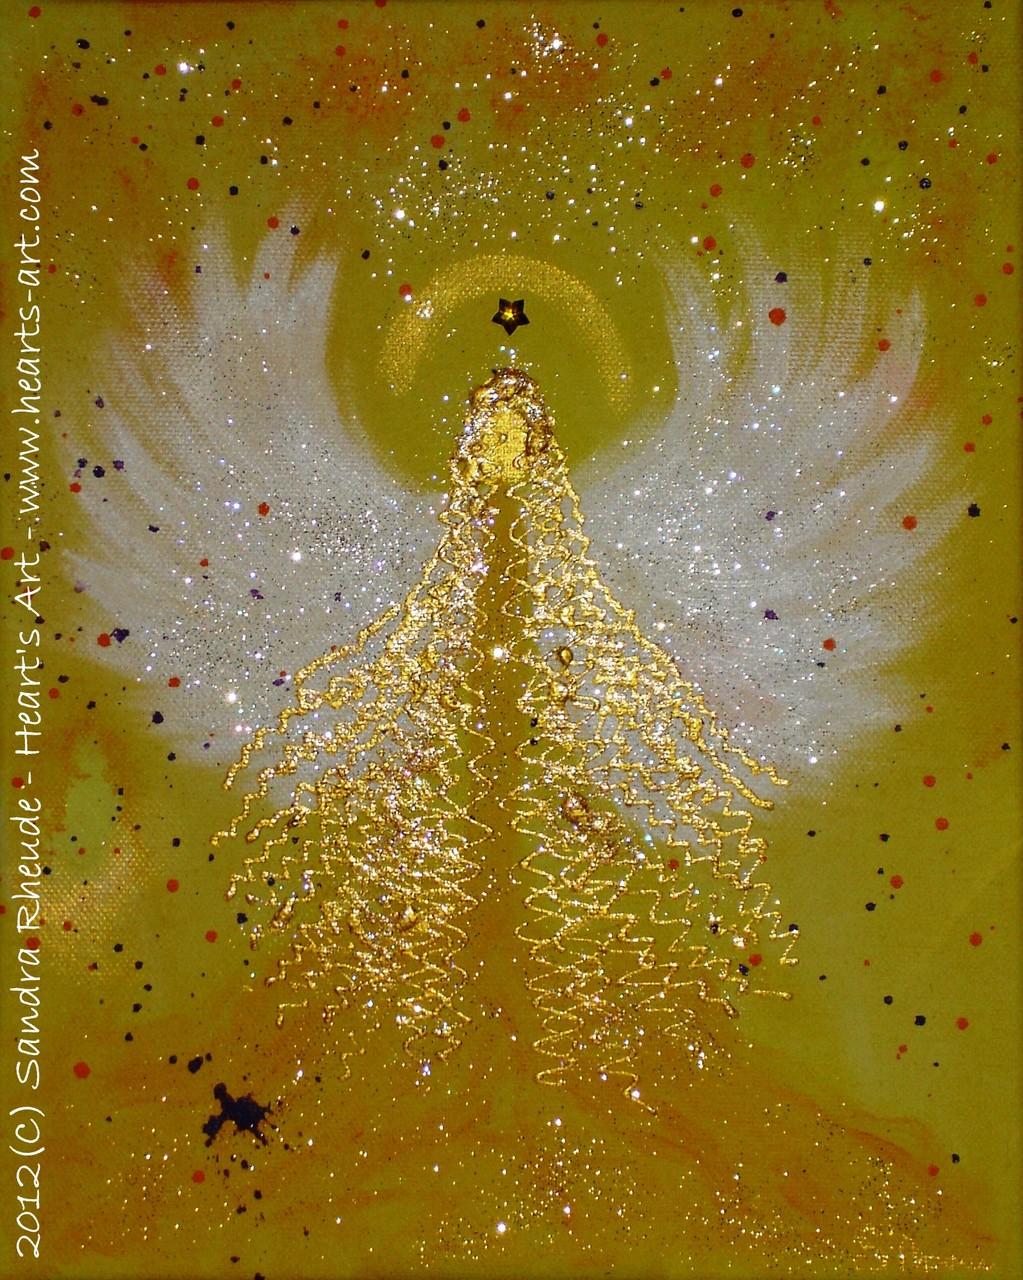 Kinder-Schutzengel 'Sweet Honey' - 2012/42 - Acryl auf Leinwand - 24 x 30 cm - verkauft (Wien)